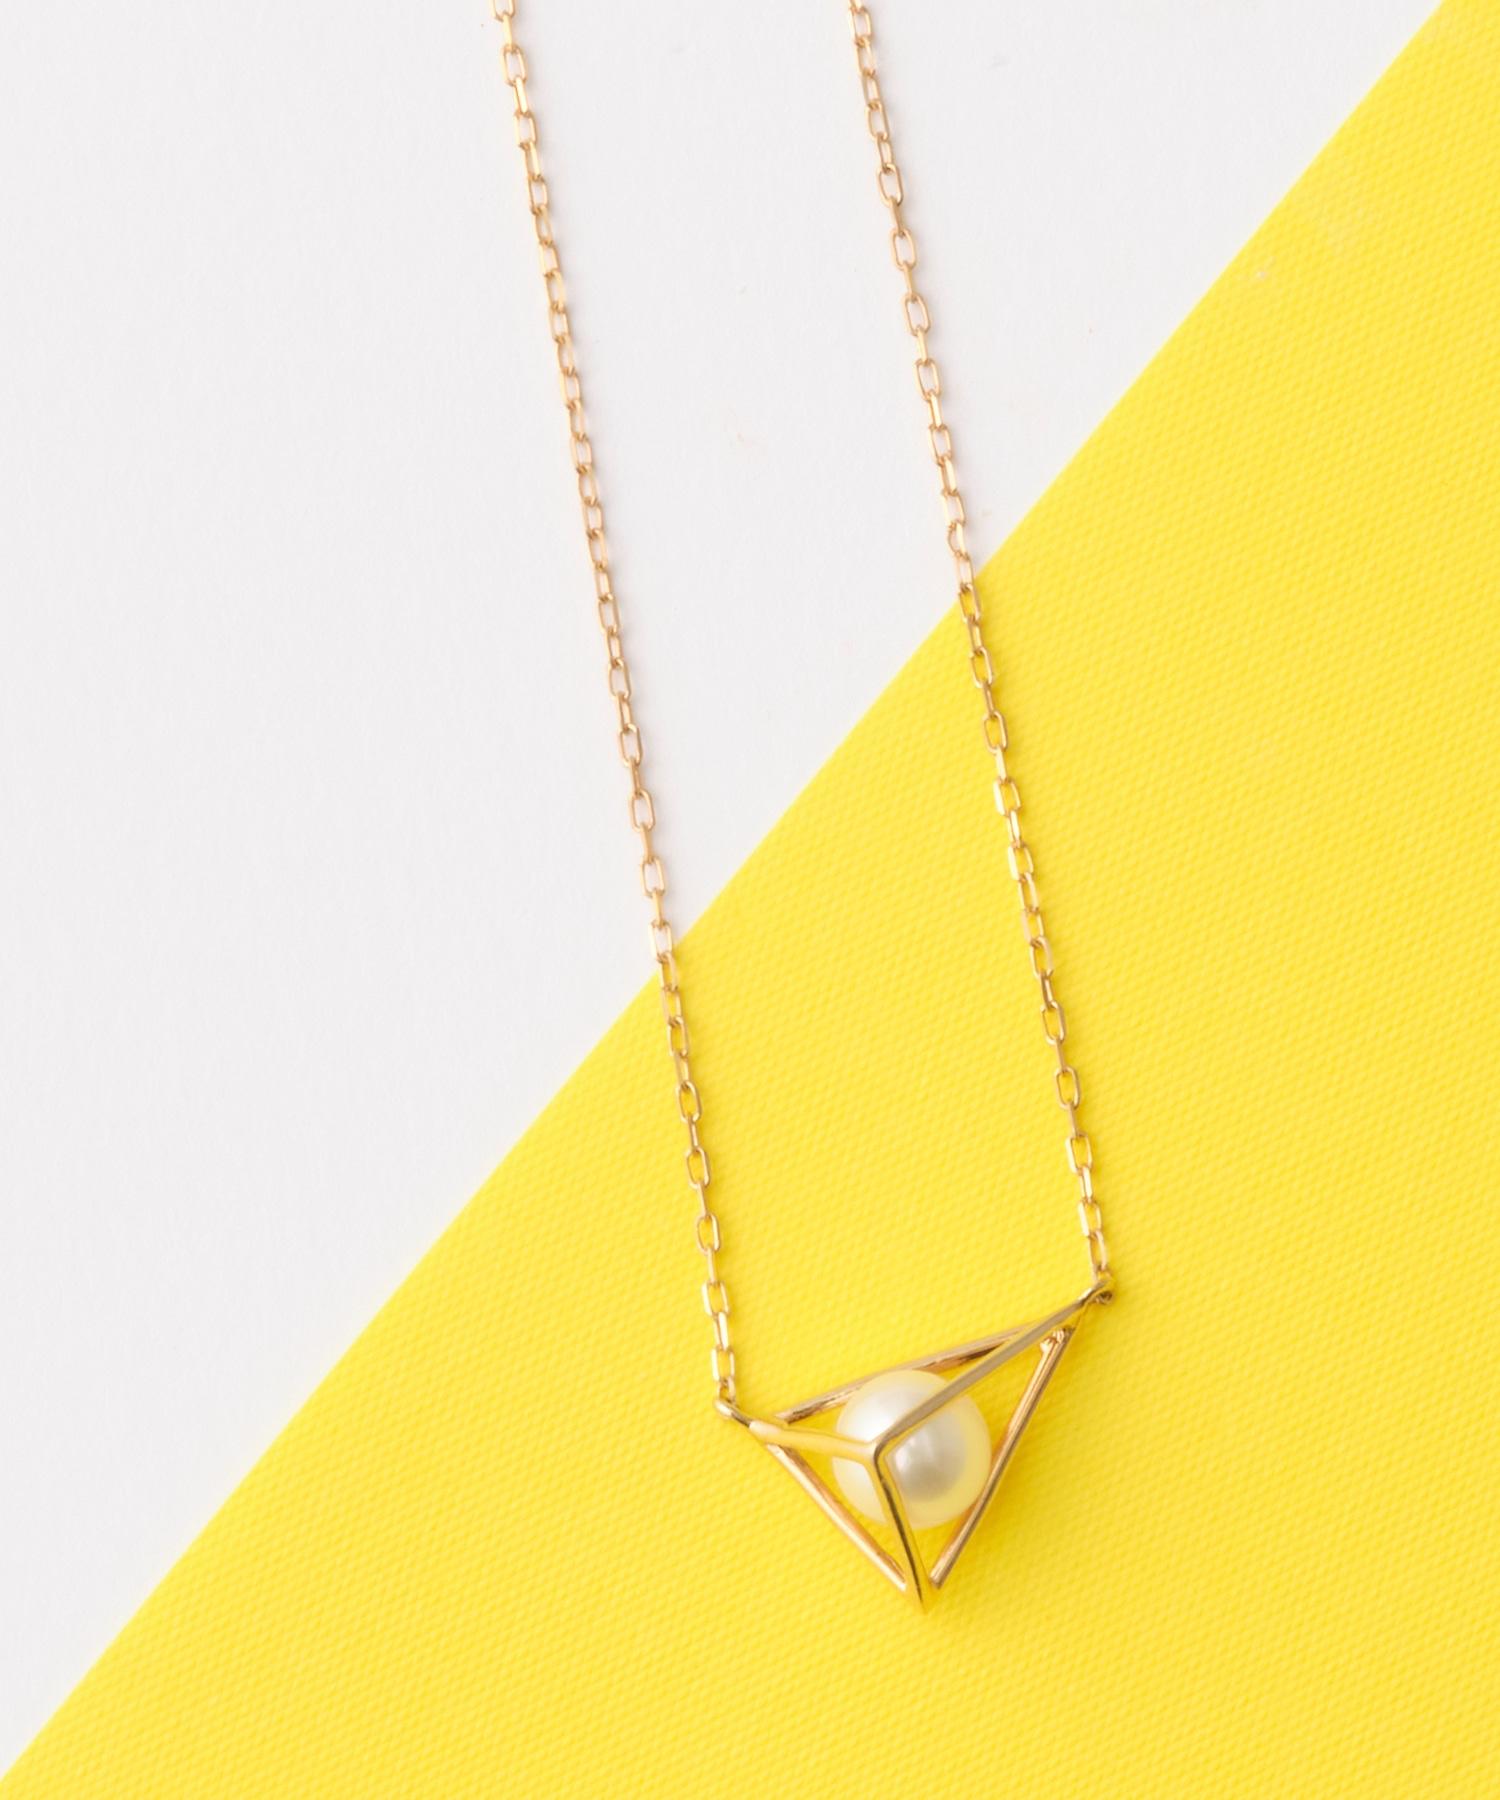 tetrahedron pearlネックレス